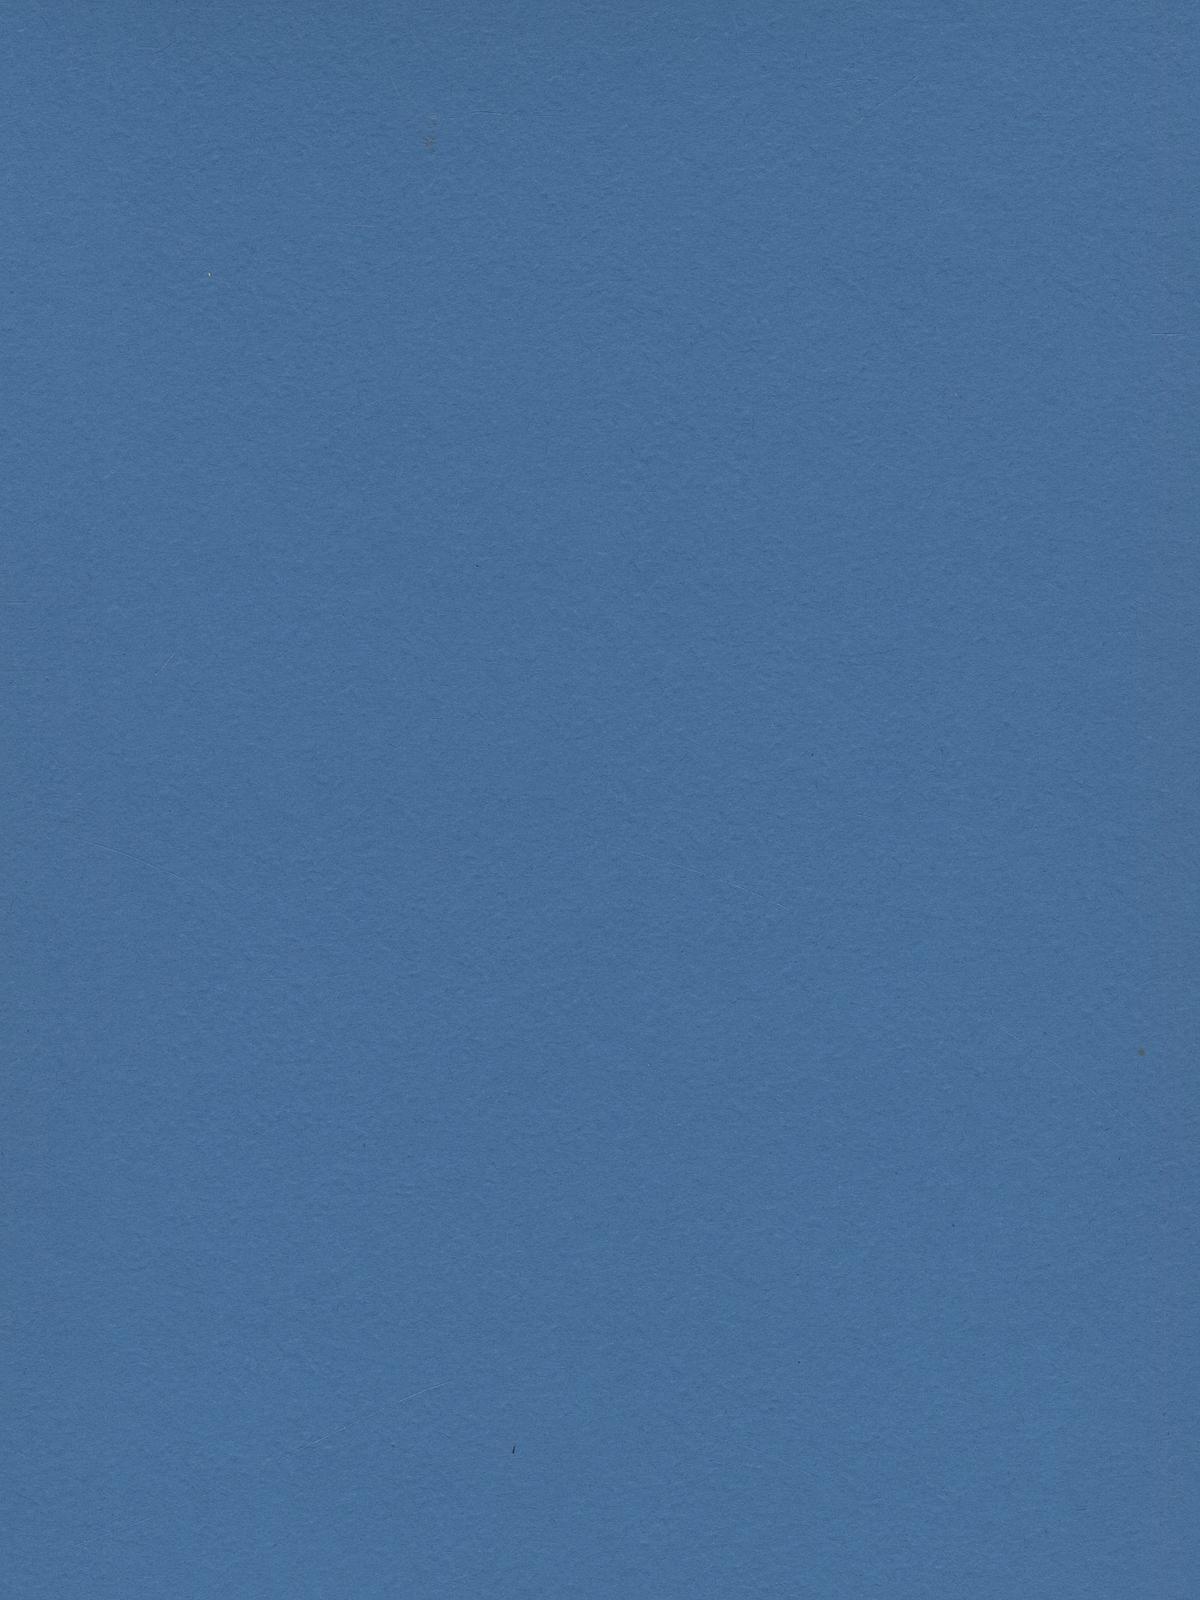 Classic Cardstock 8 1 2 In. X 11 In. Nautical Blue Medium Sheet